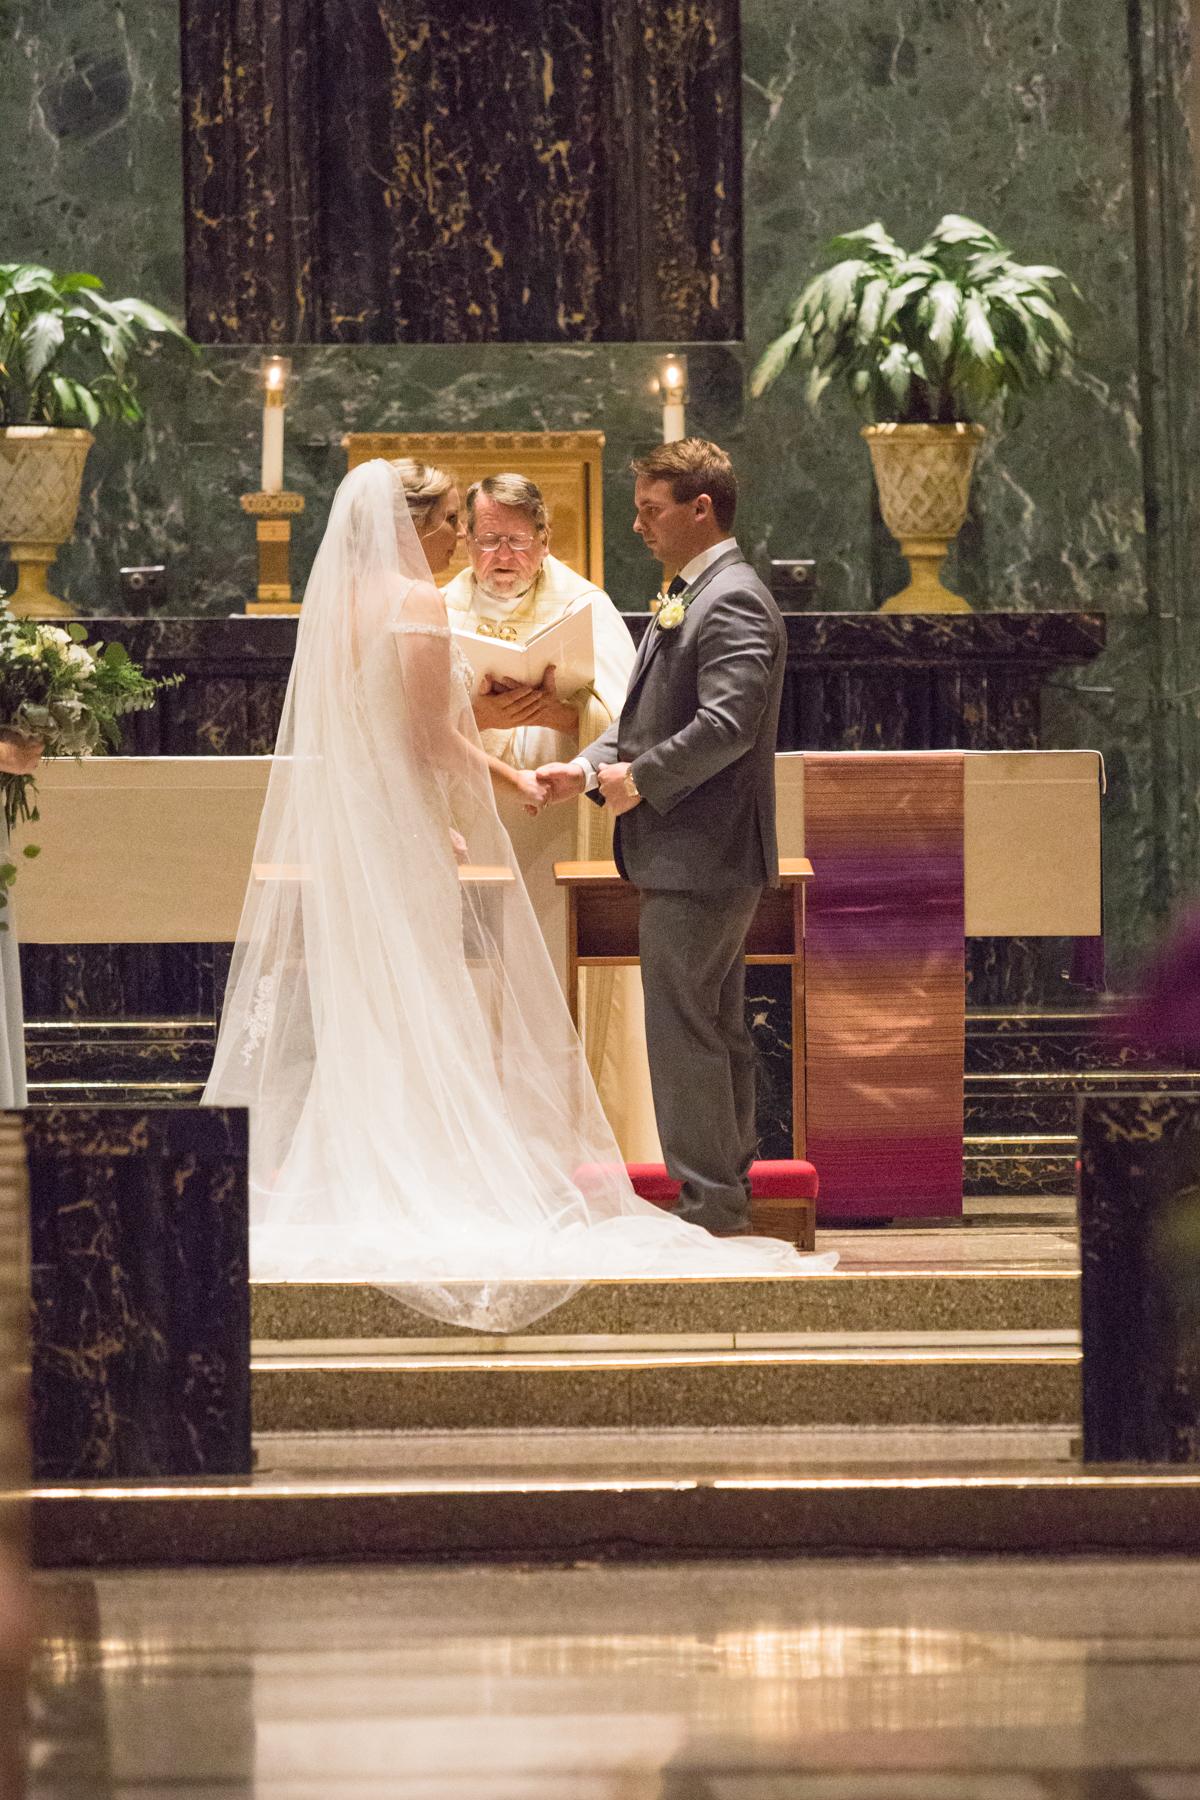 Kelli-and-Matt-Nashville-Wedding-Sneak-Peak-0238.jpg